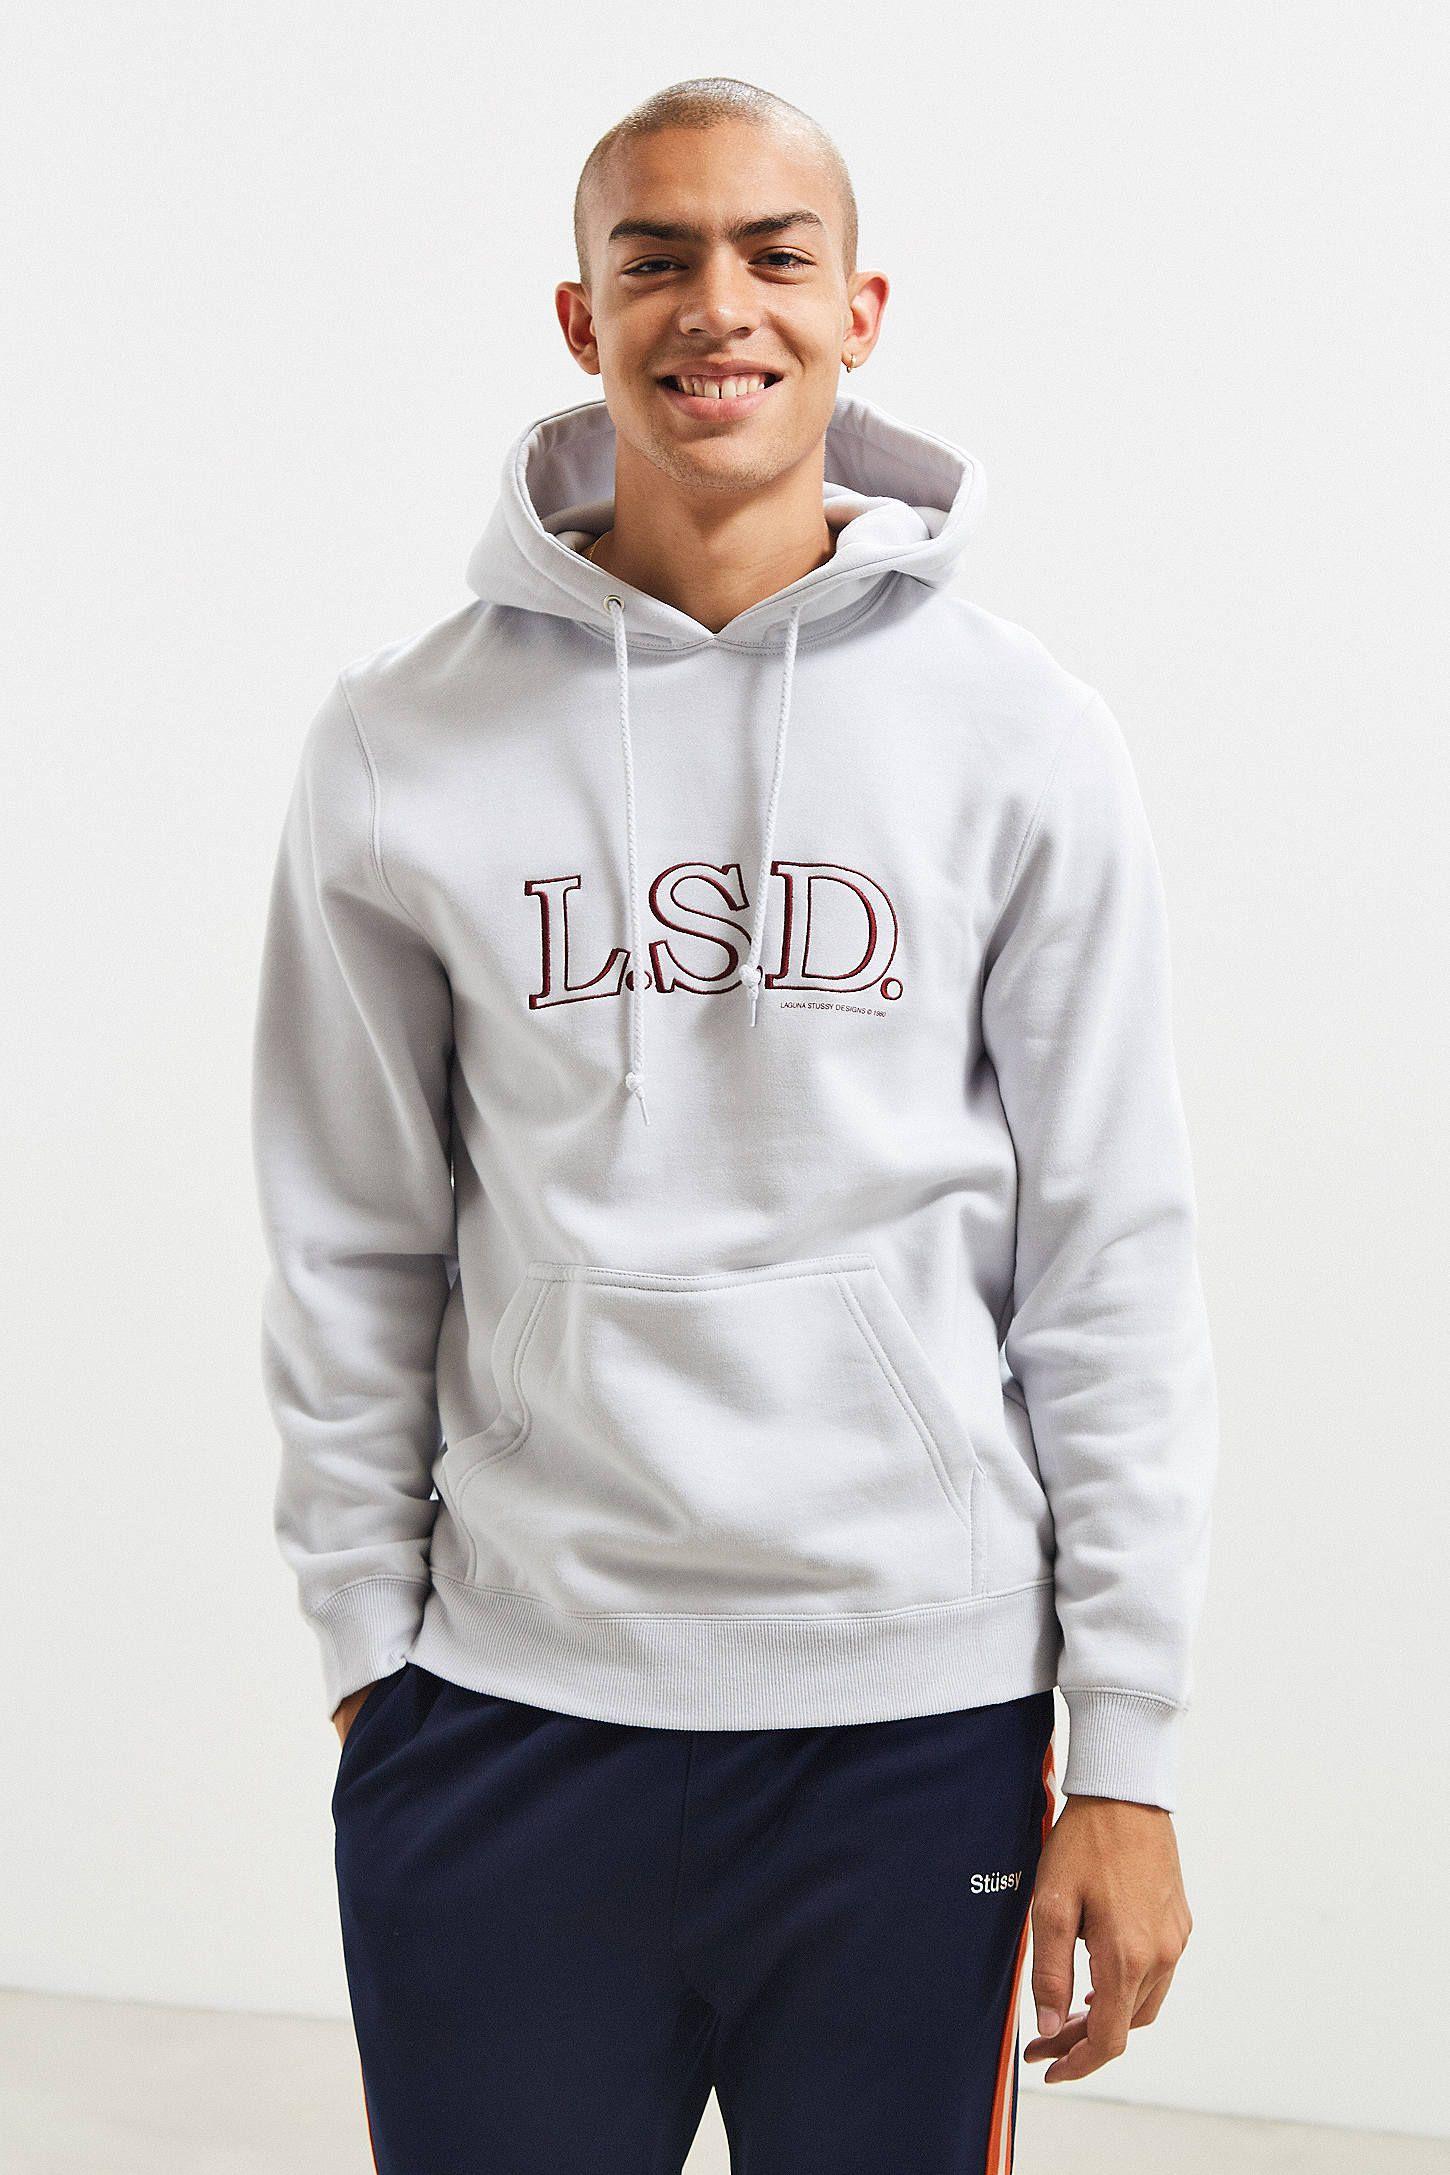 da713a72f67 Stussy LSD Embroidered Hoodie Sweatshirt